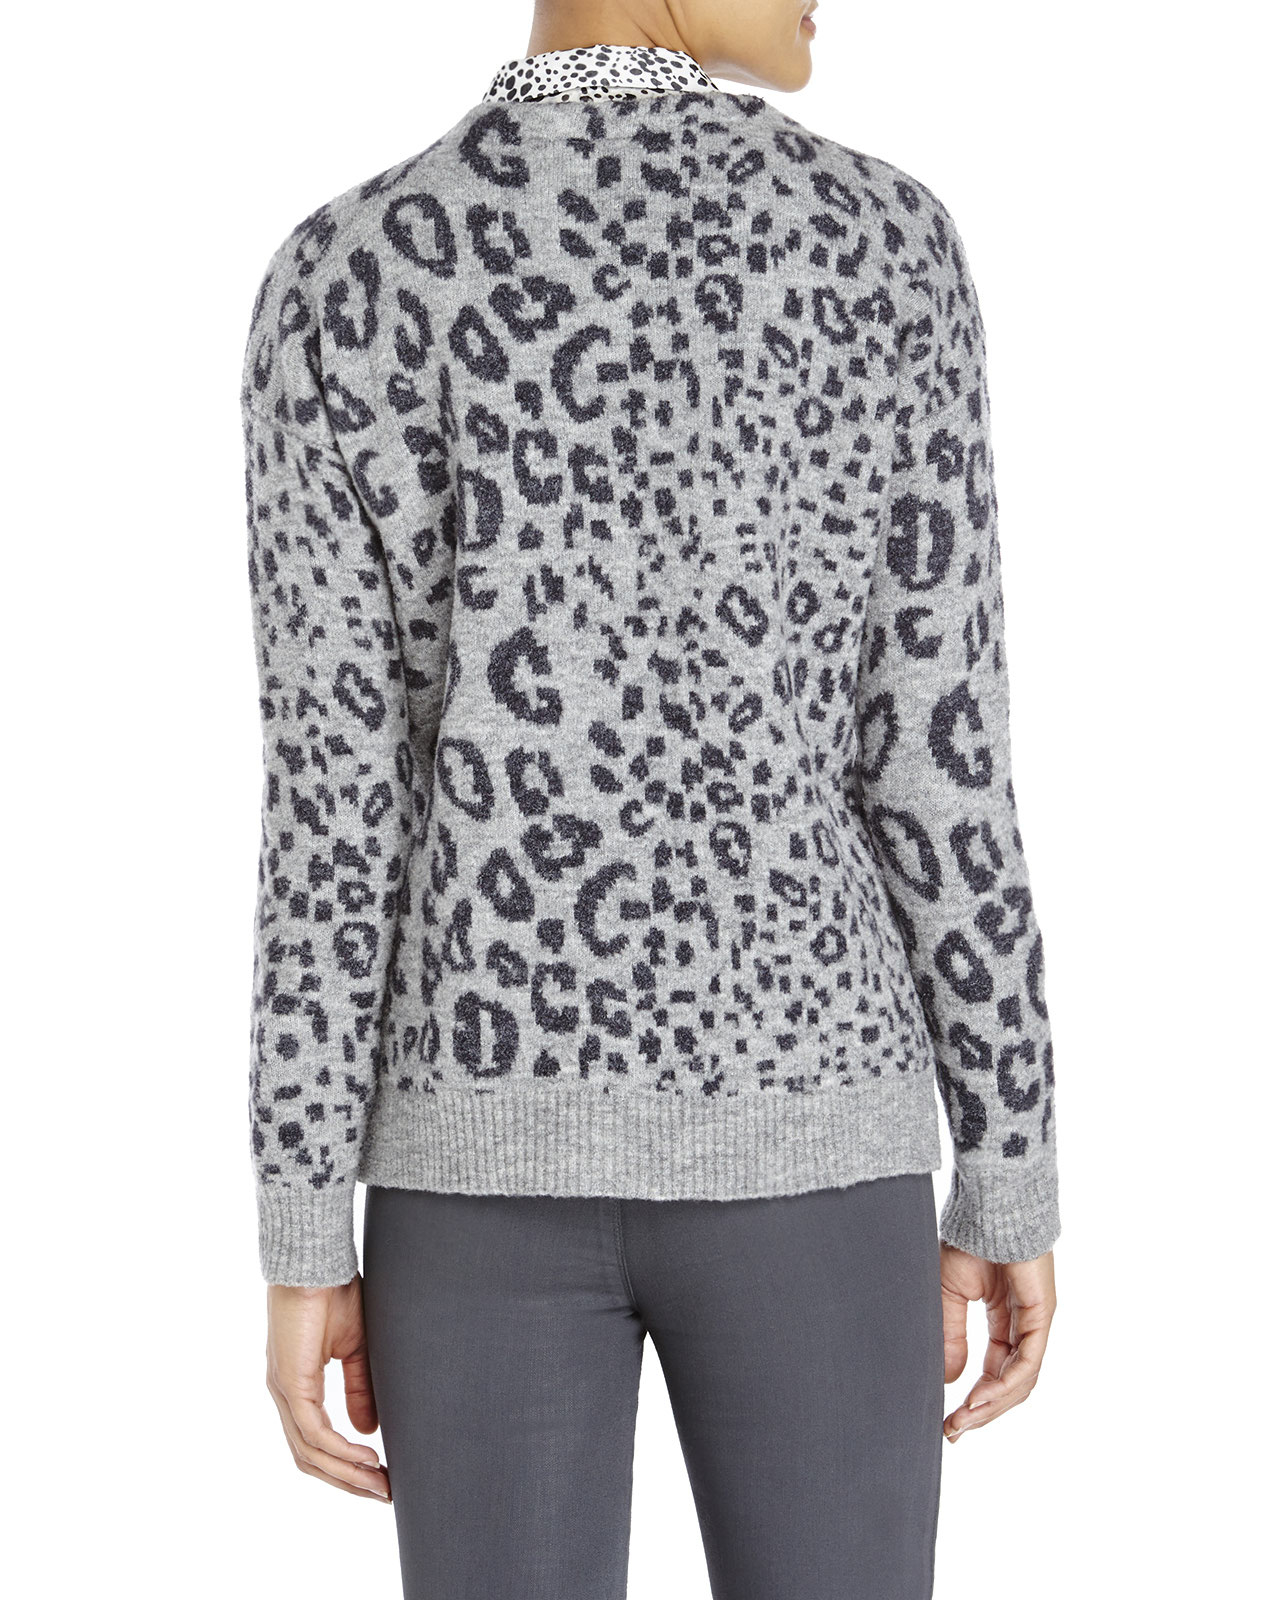 The kooples Leopard Print Cardigan in Gray | Lyst